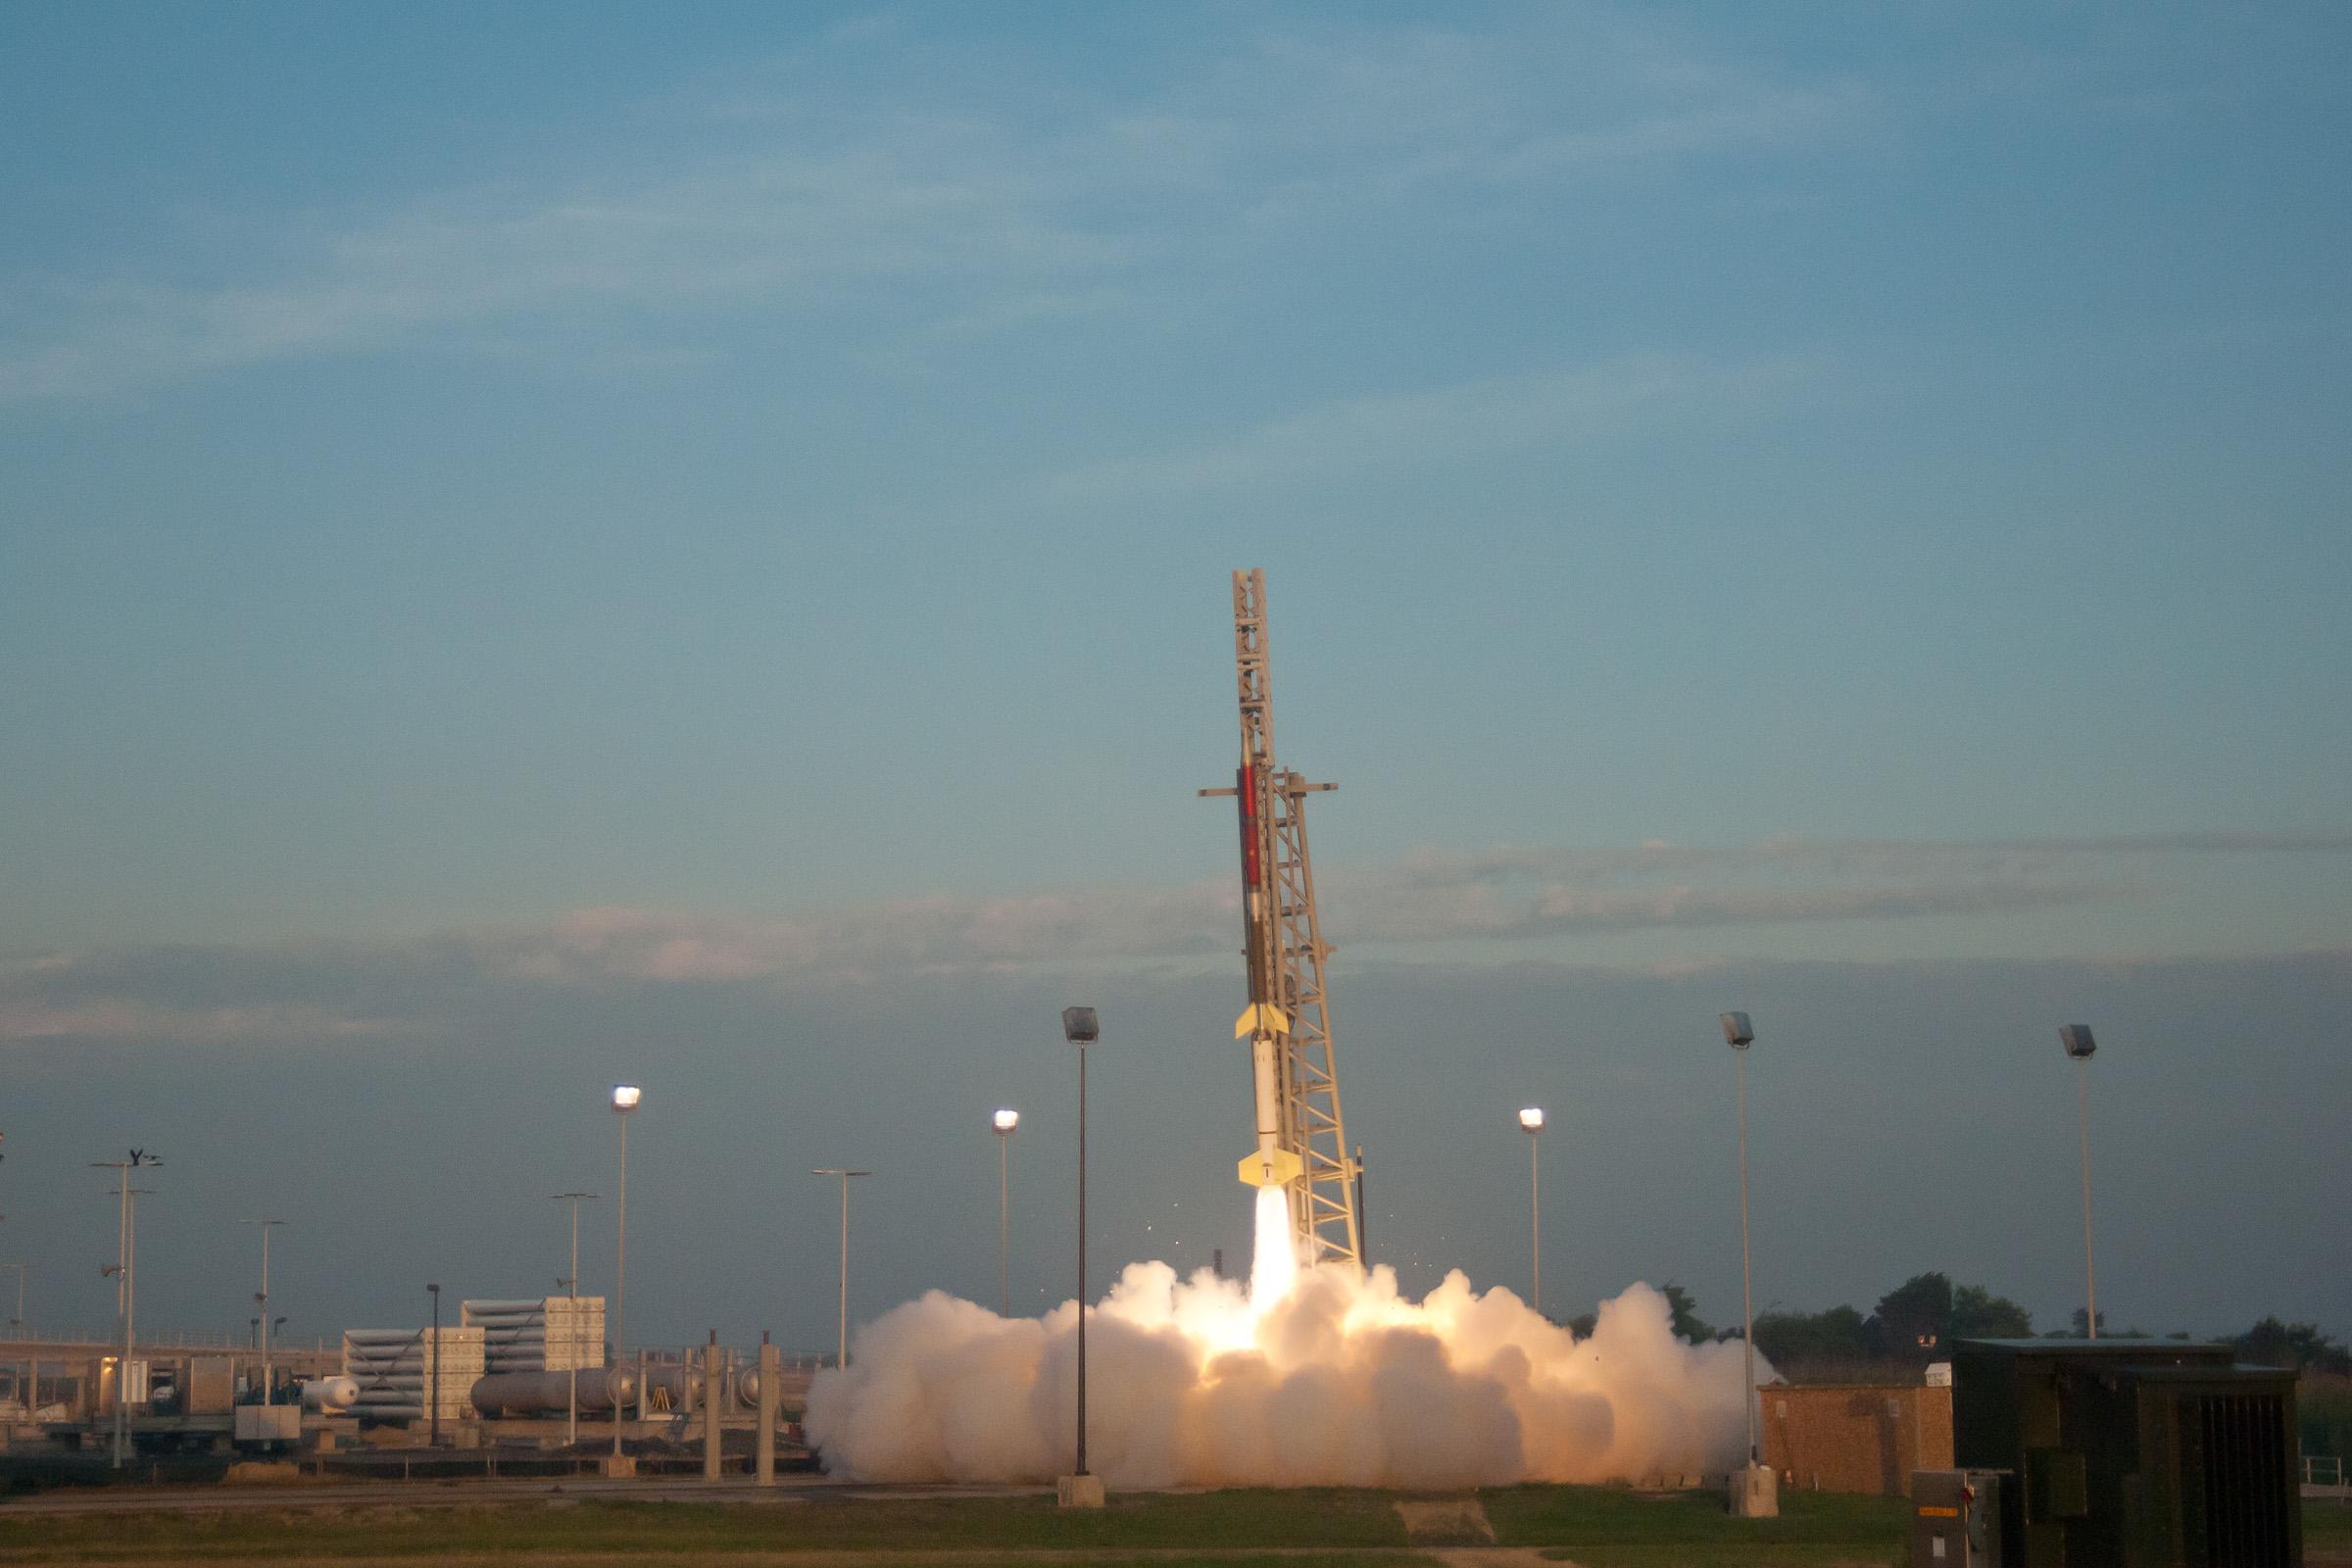 nasa wallops rocket launch - photo #26